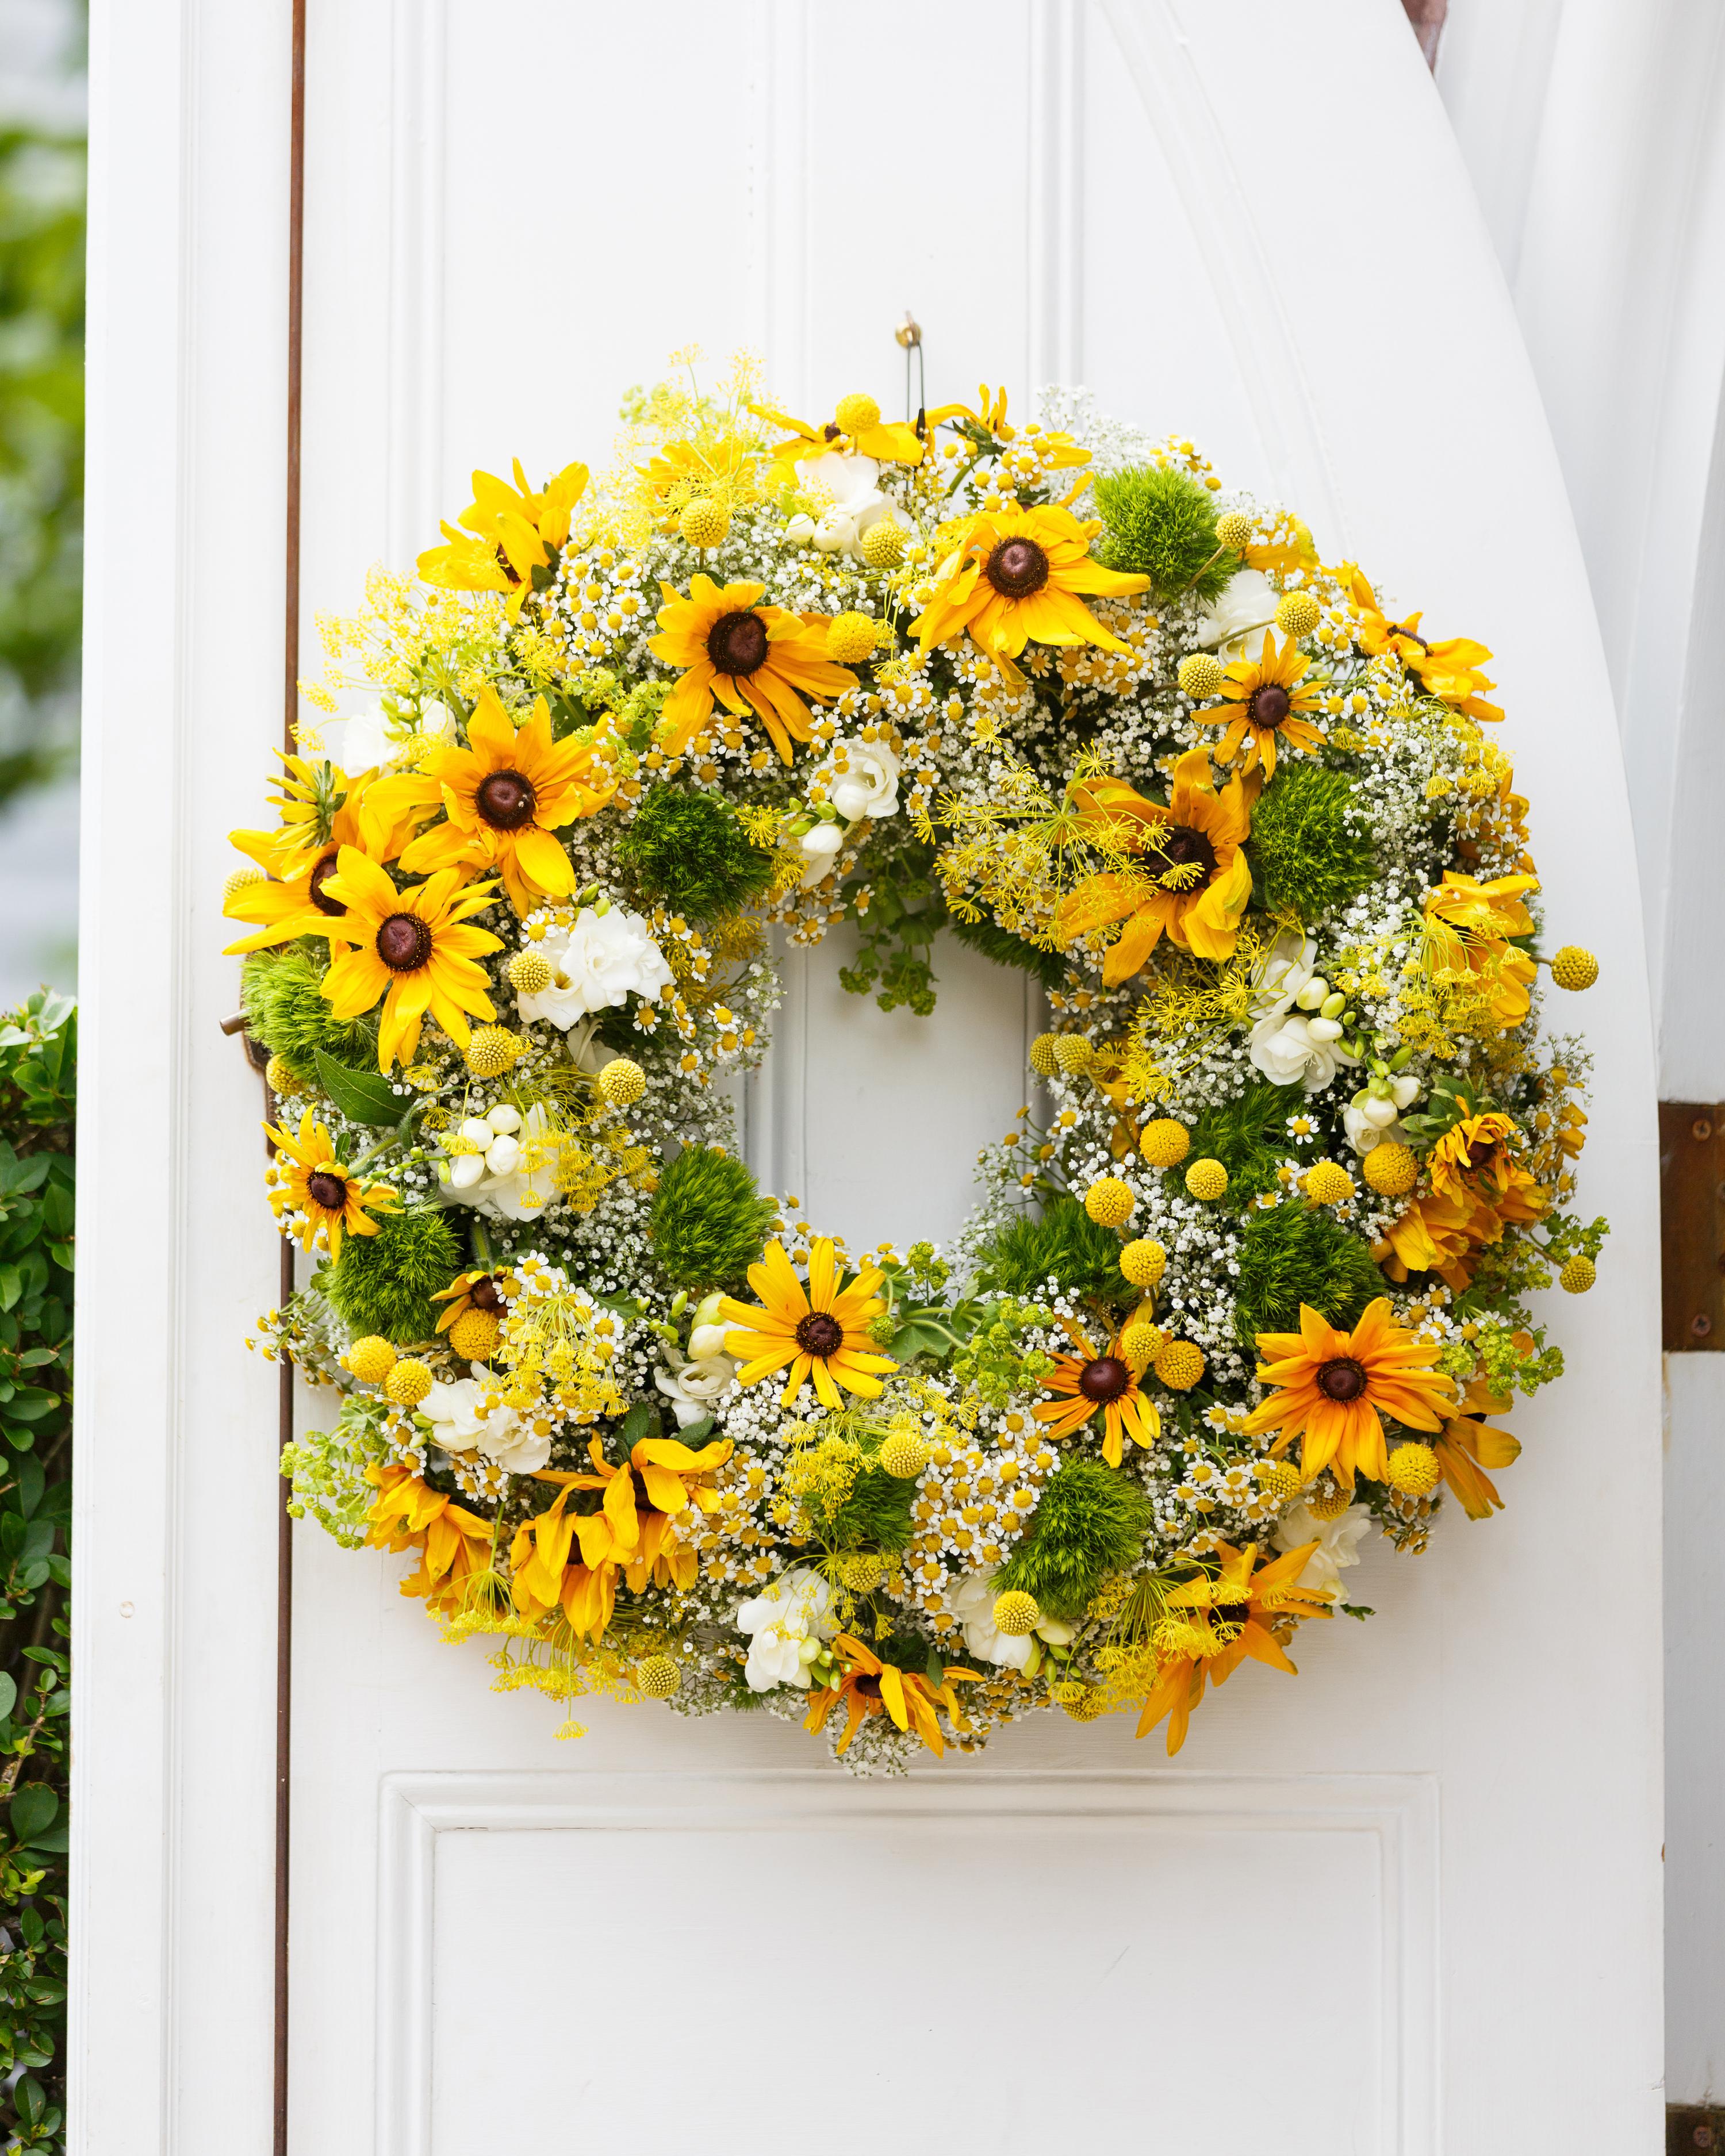 kristel-austin-wedding-wreath-0591-s11860-0415.jpg